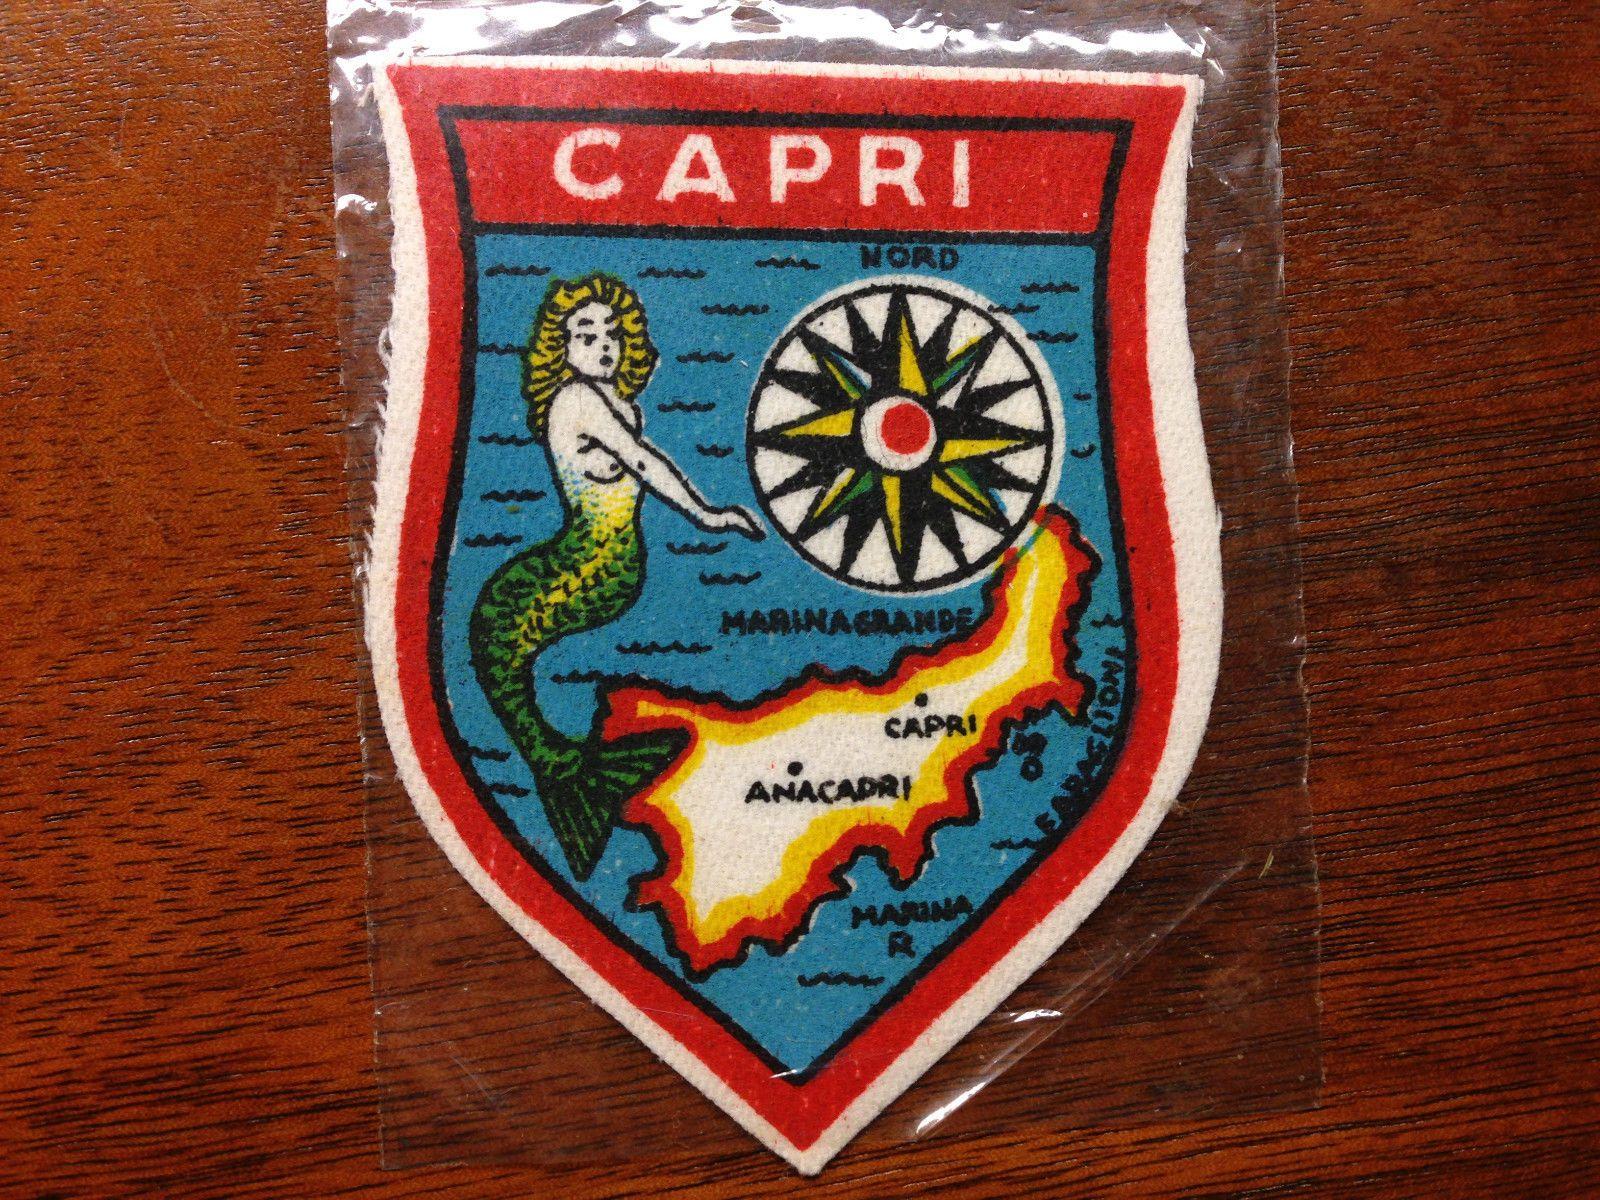 Vintage Italy Italia Italian Capri Anacapri Cybele Travel Souvenir Patch • $17.95 - PicClick